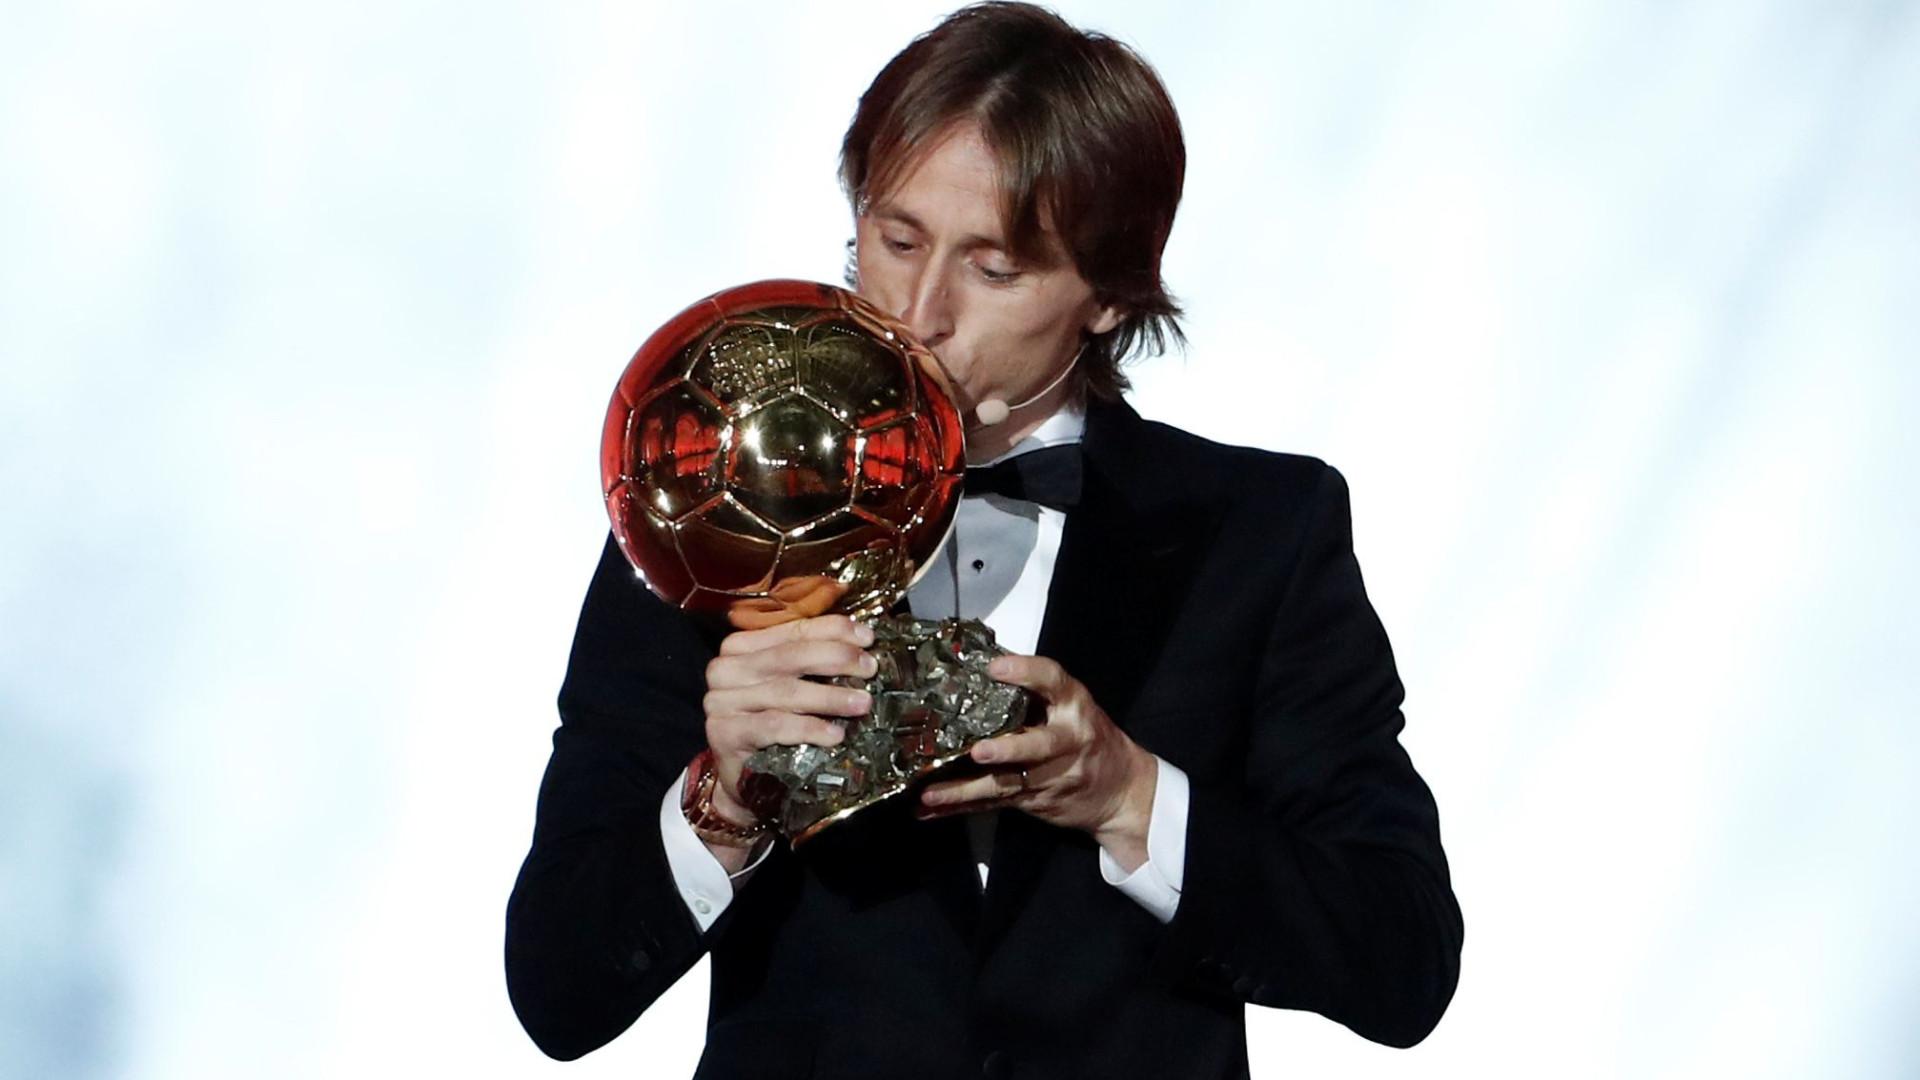 Oficial: Luka Modric conquista a Bola de Ouro 2018